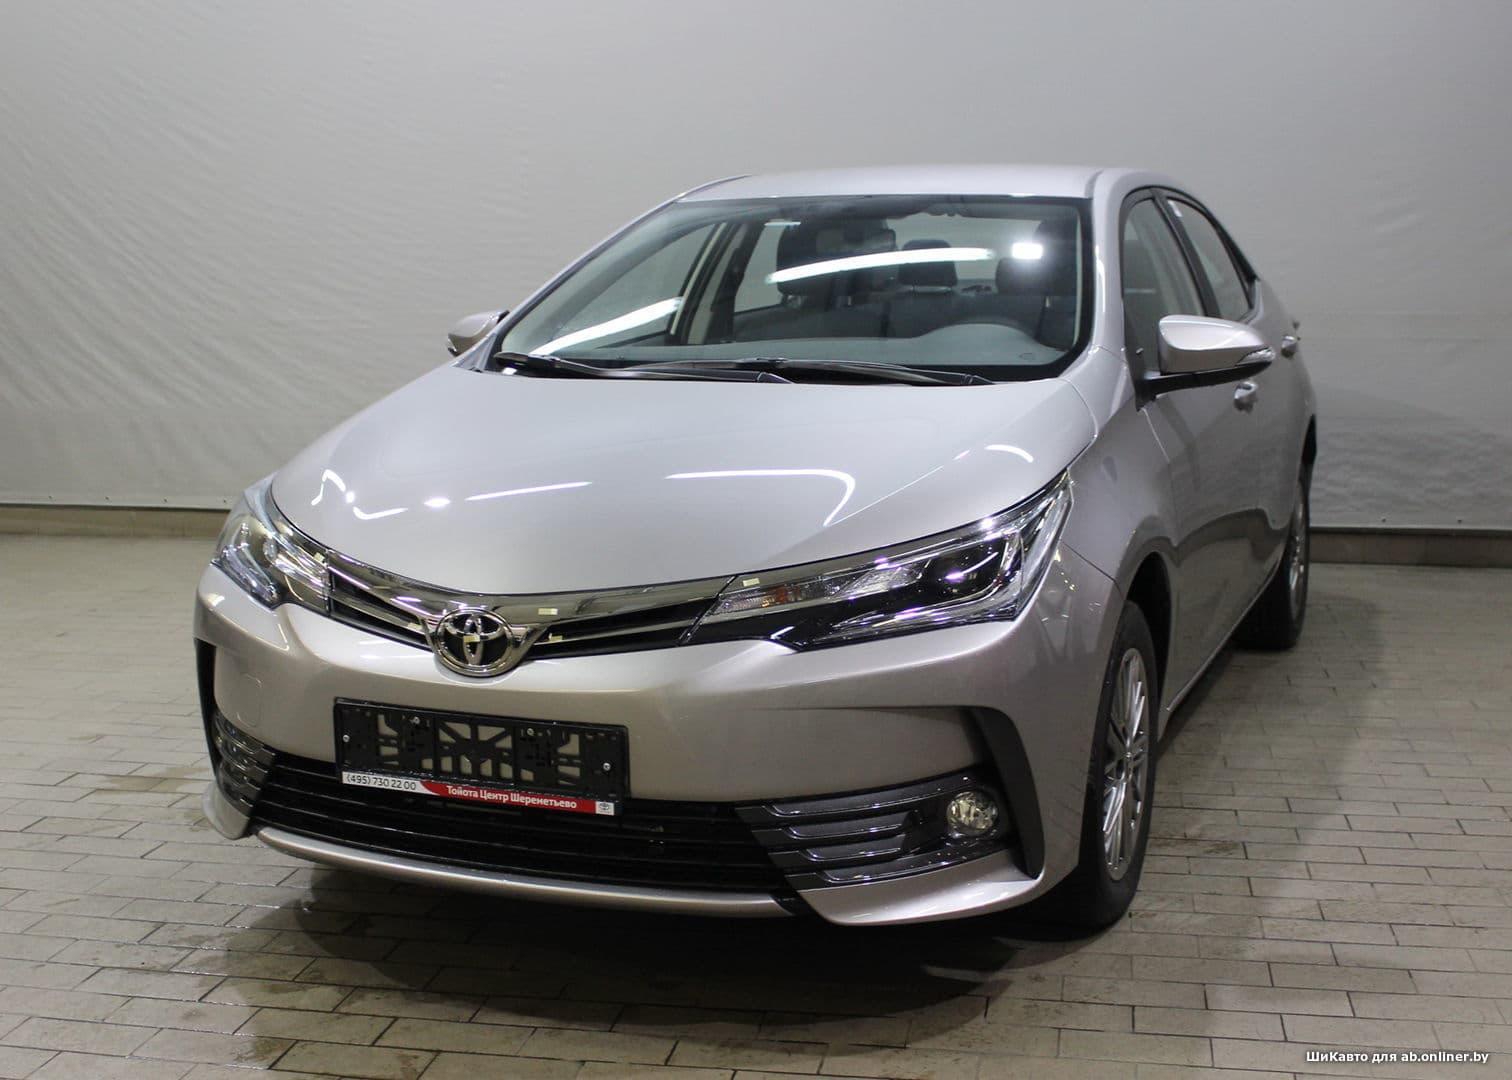 Toyota Corolla Стиль Плюс 1.6 CVT